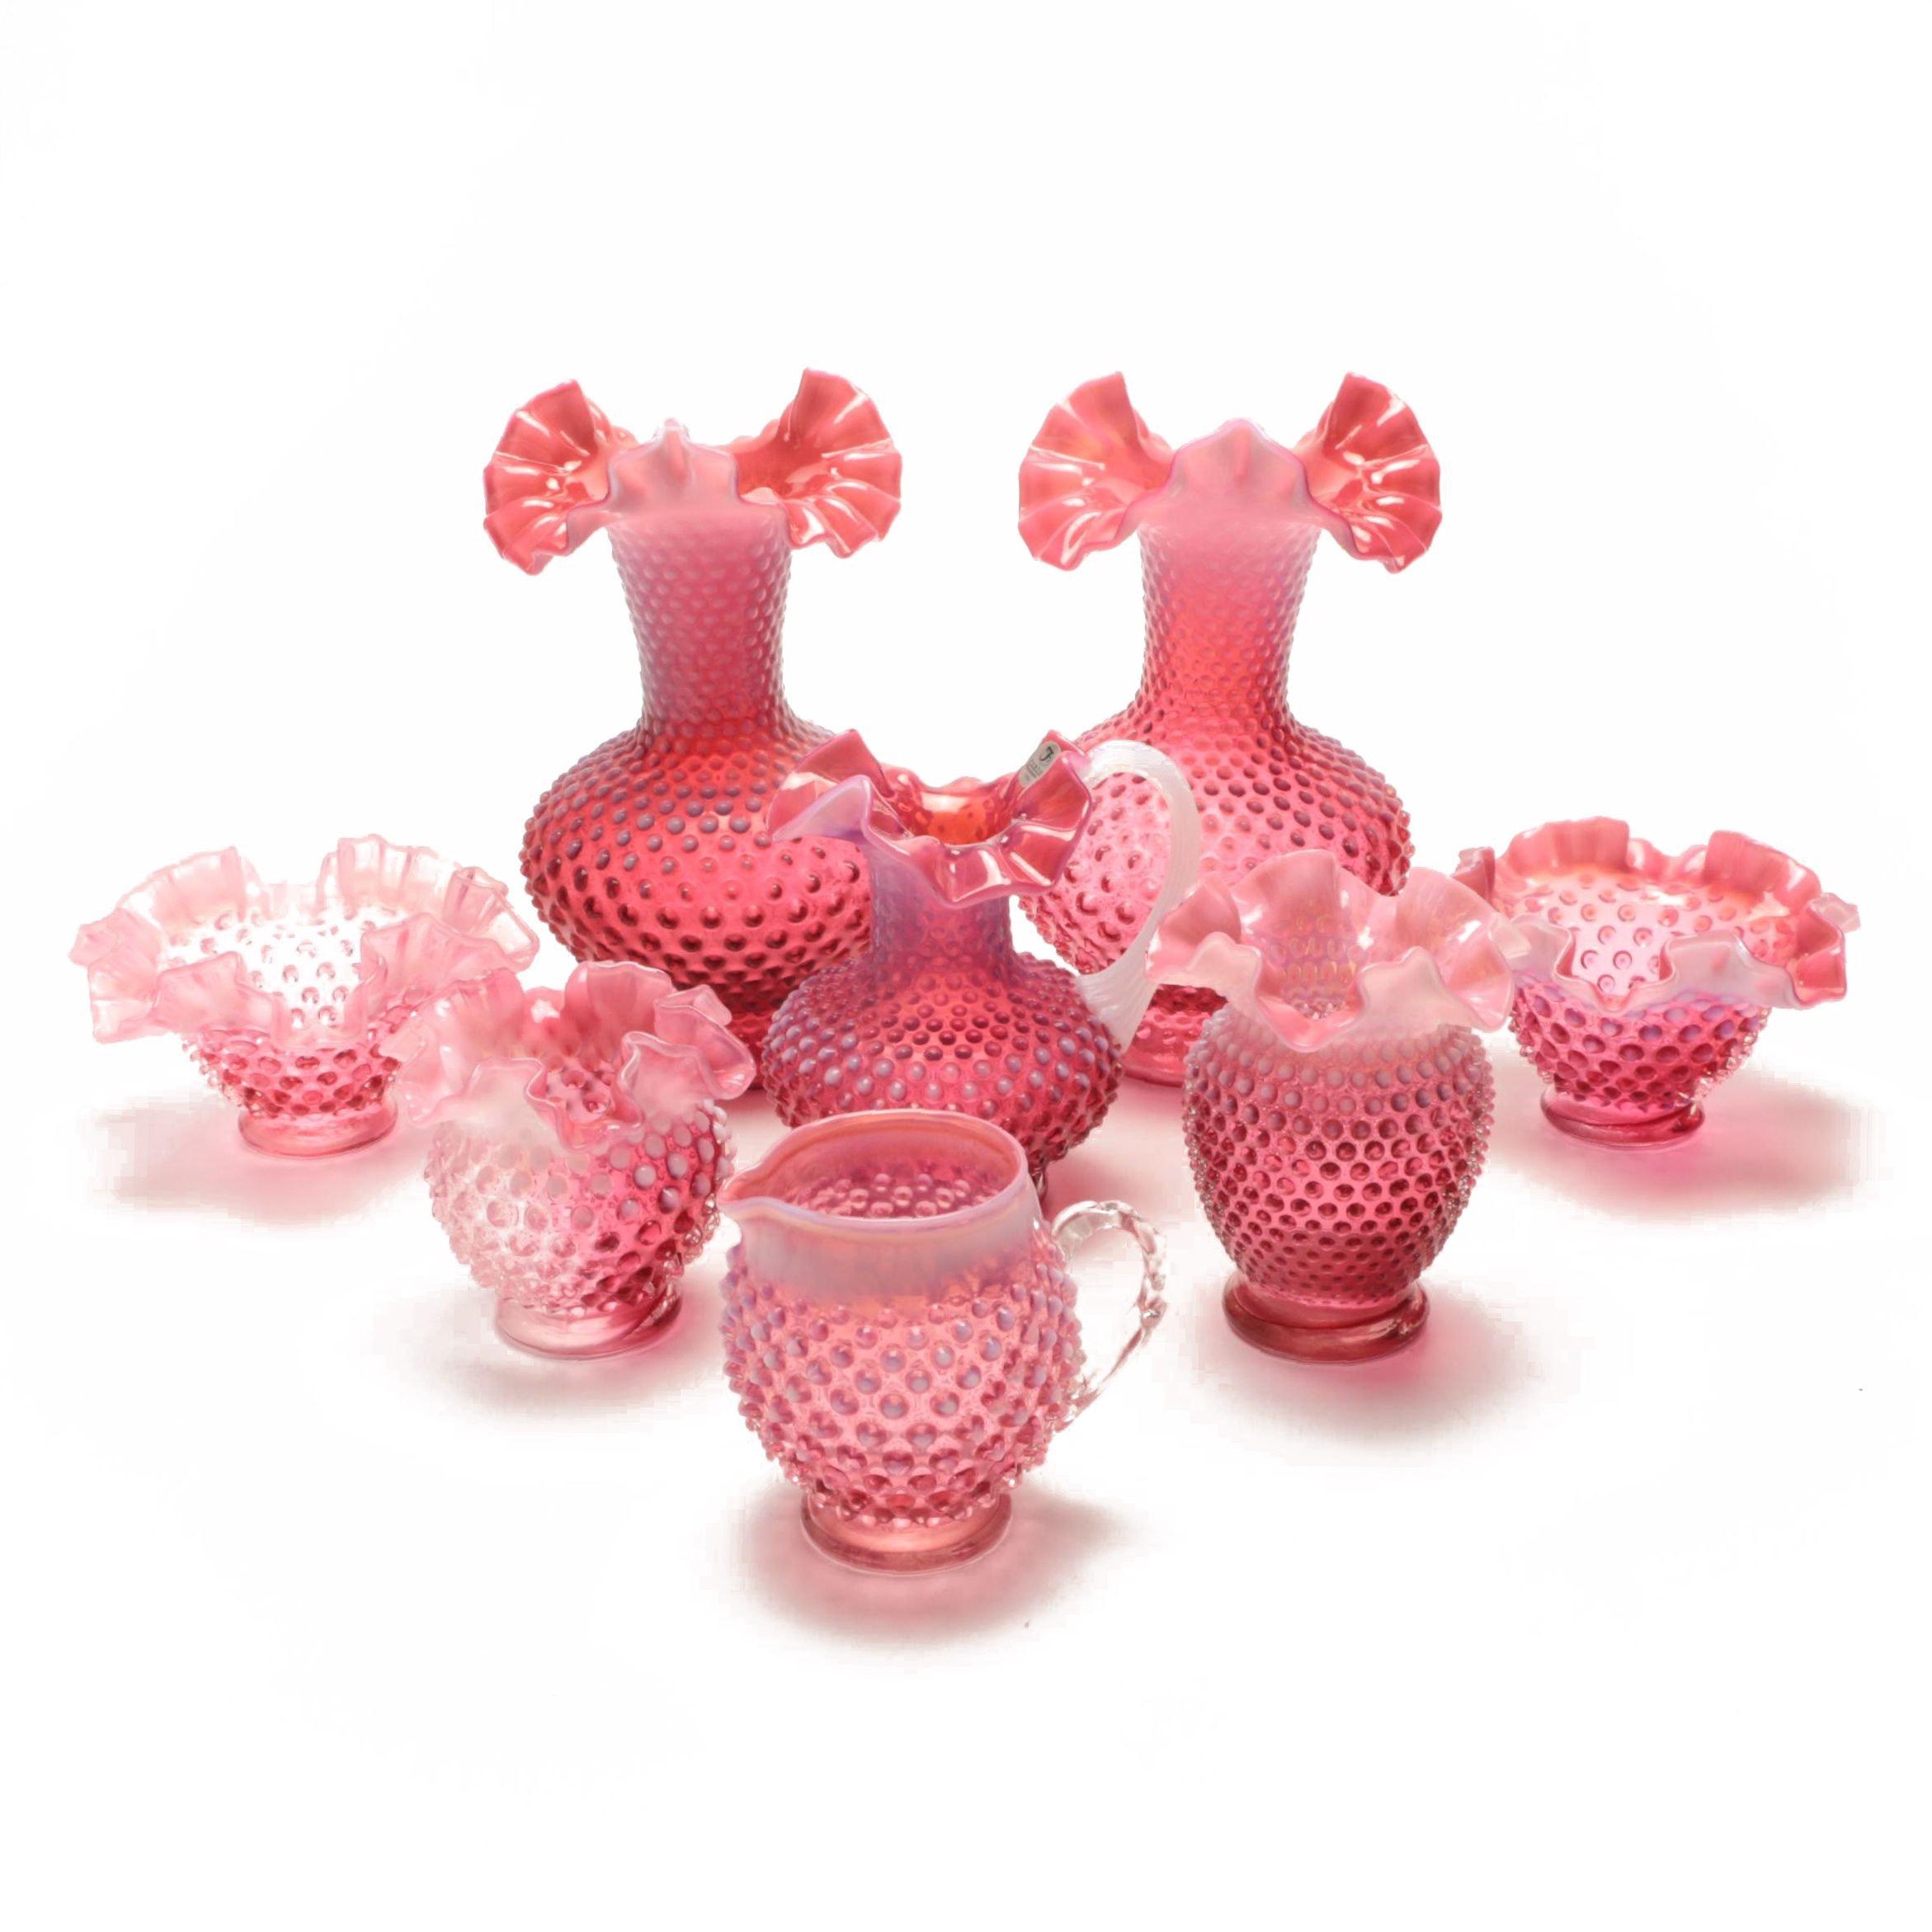 Assortment of Cranberry Opalescent Hobnail Glassware Including Fenton